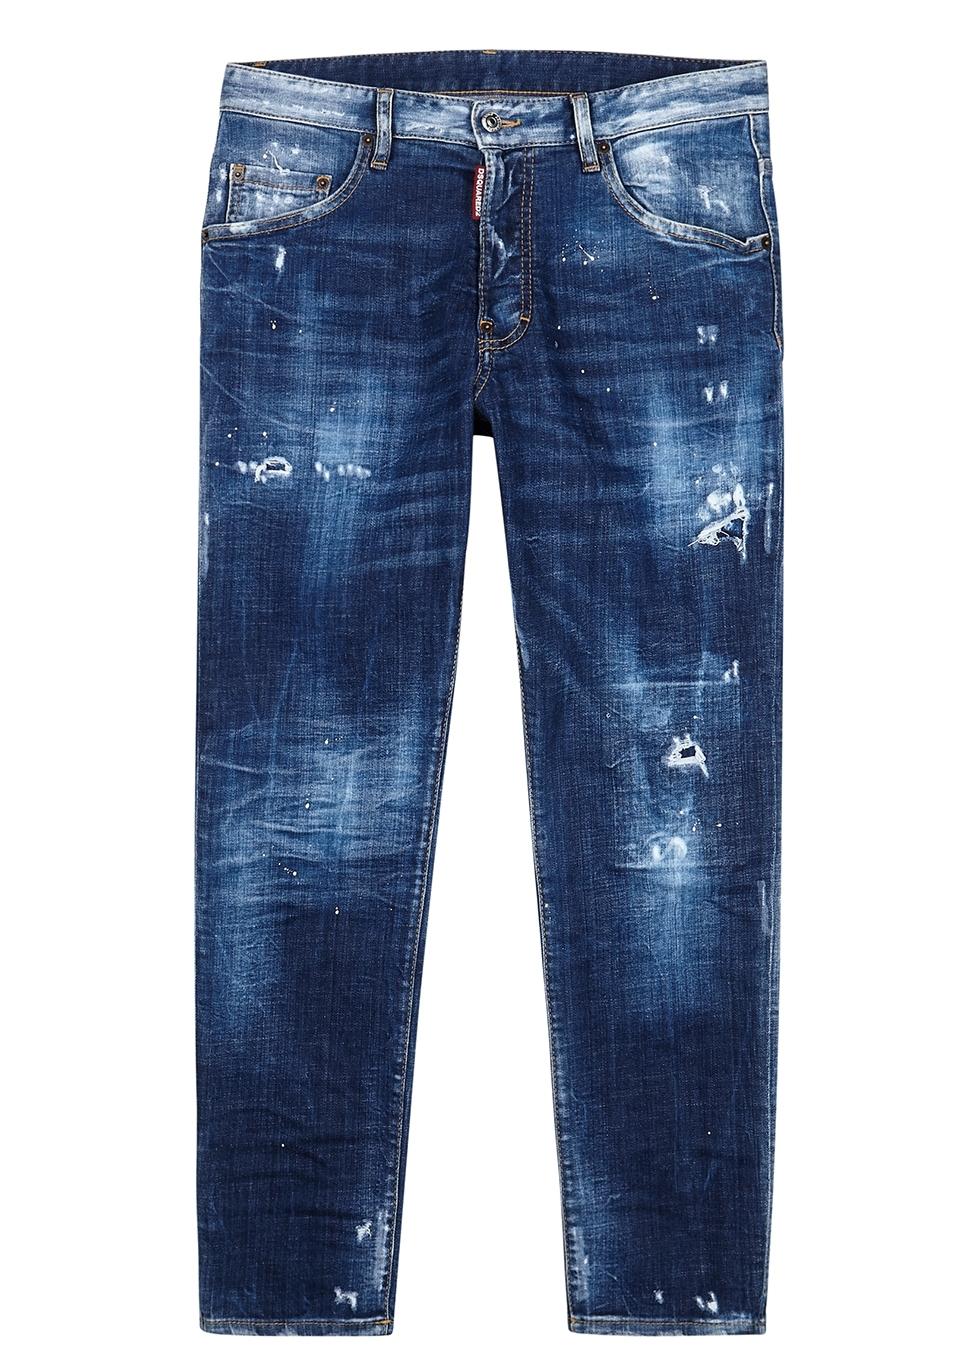 4e7b056d Men's Designer Jeans and Luxury Denim - Harvey Nichols